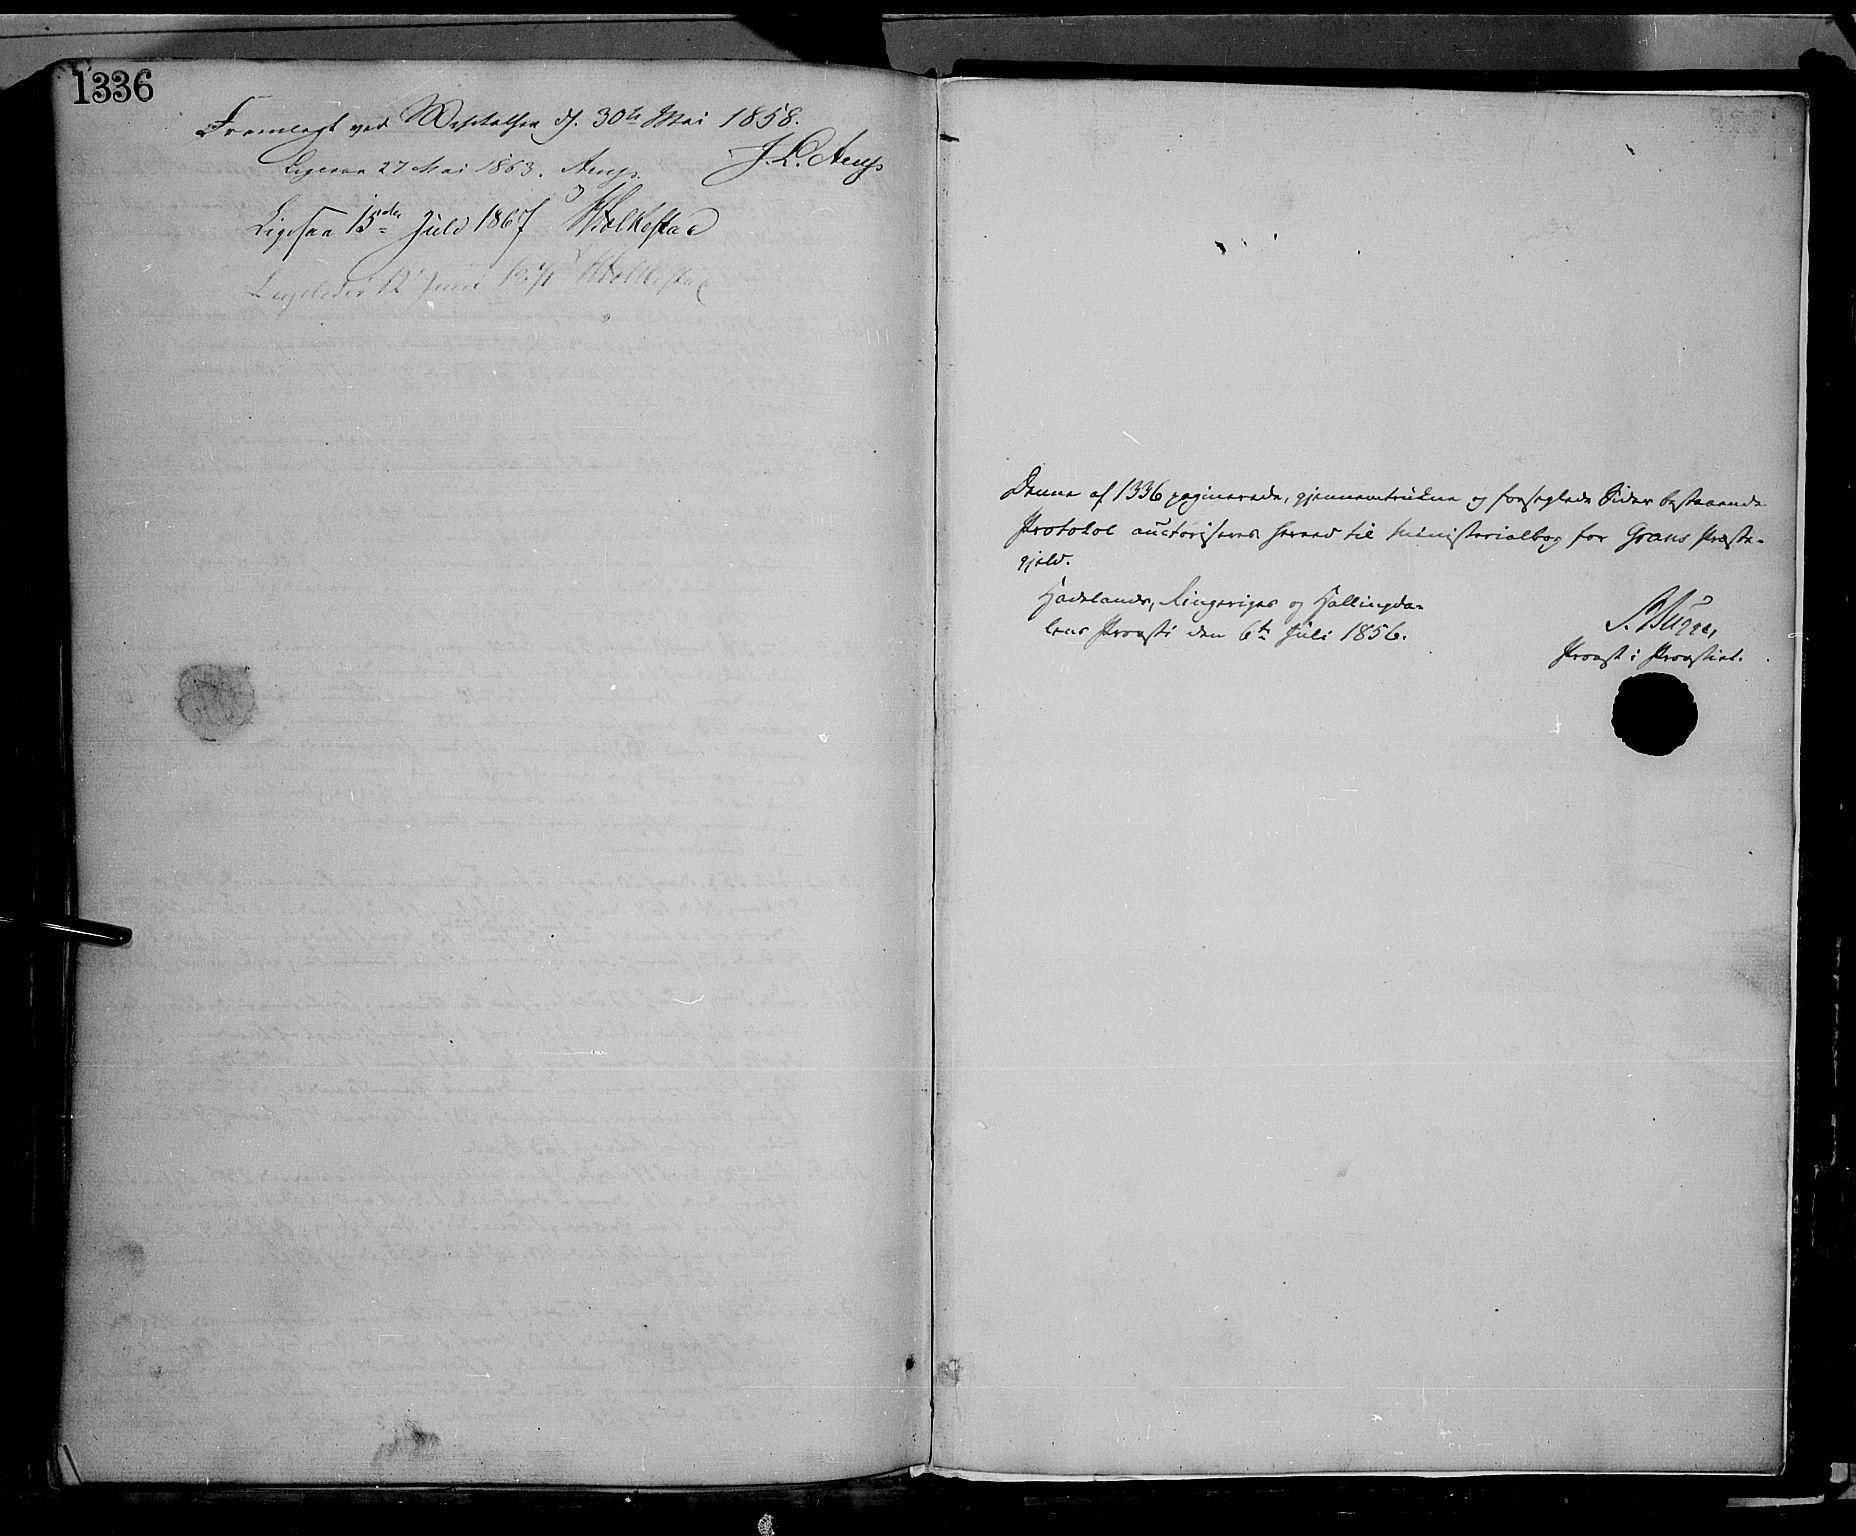 SAH, Gran prestekontor, Ministerialbok nr. 12, 1856-1874, s. 1336-1337